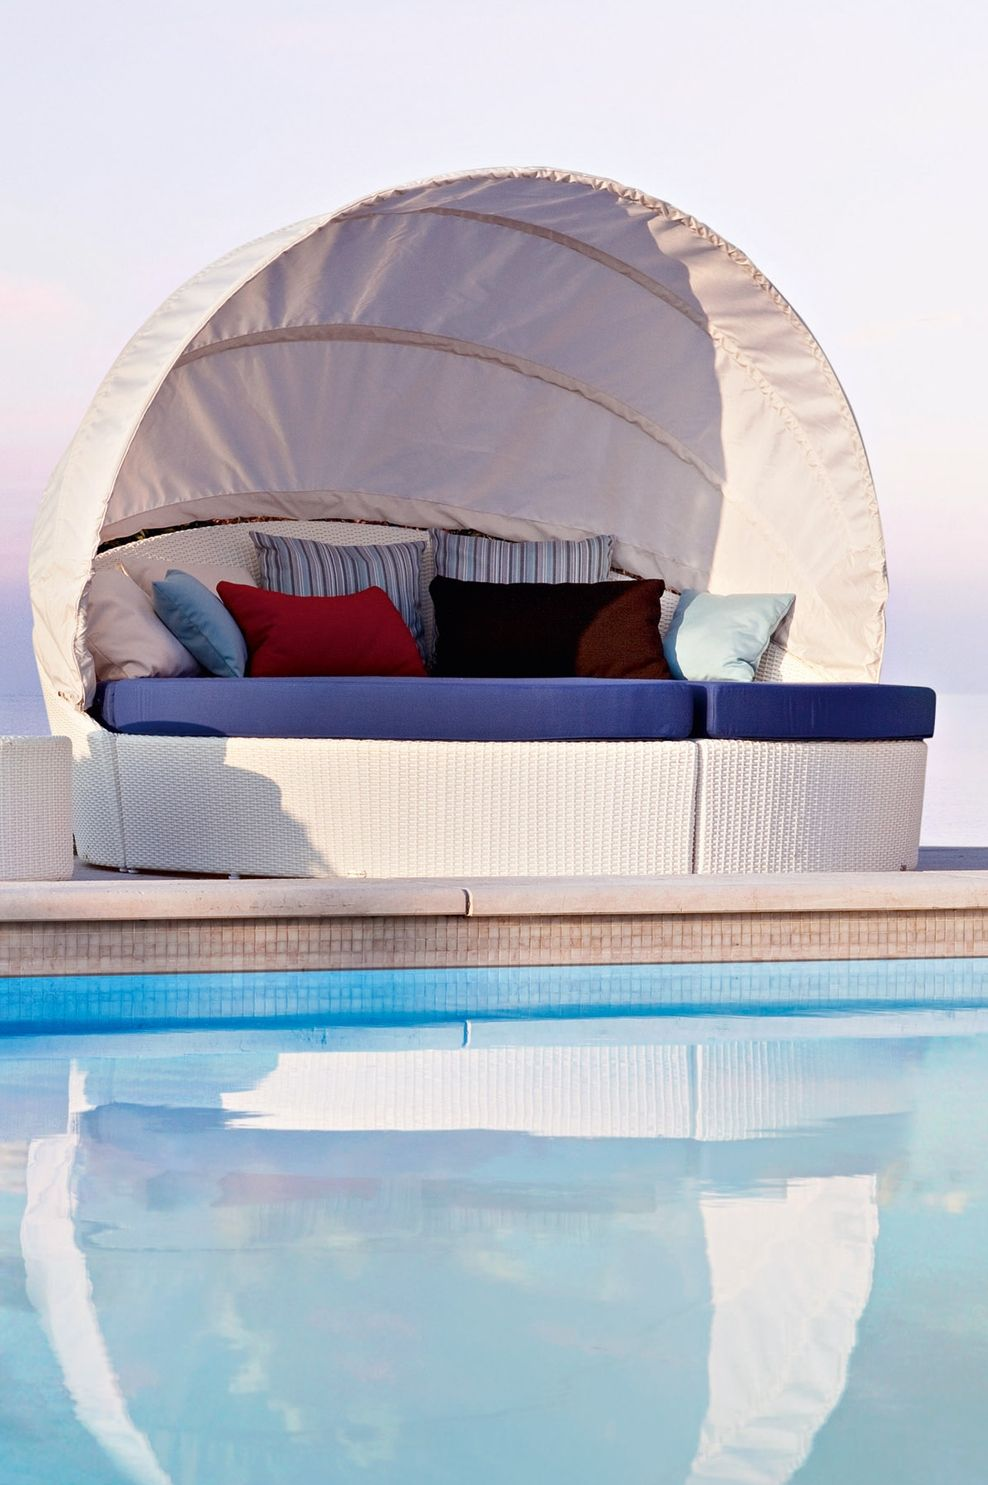 Designer Bettsofa arena varaschin designer bett sofa outdoor arena varaschin